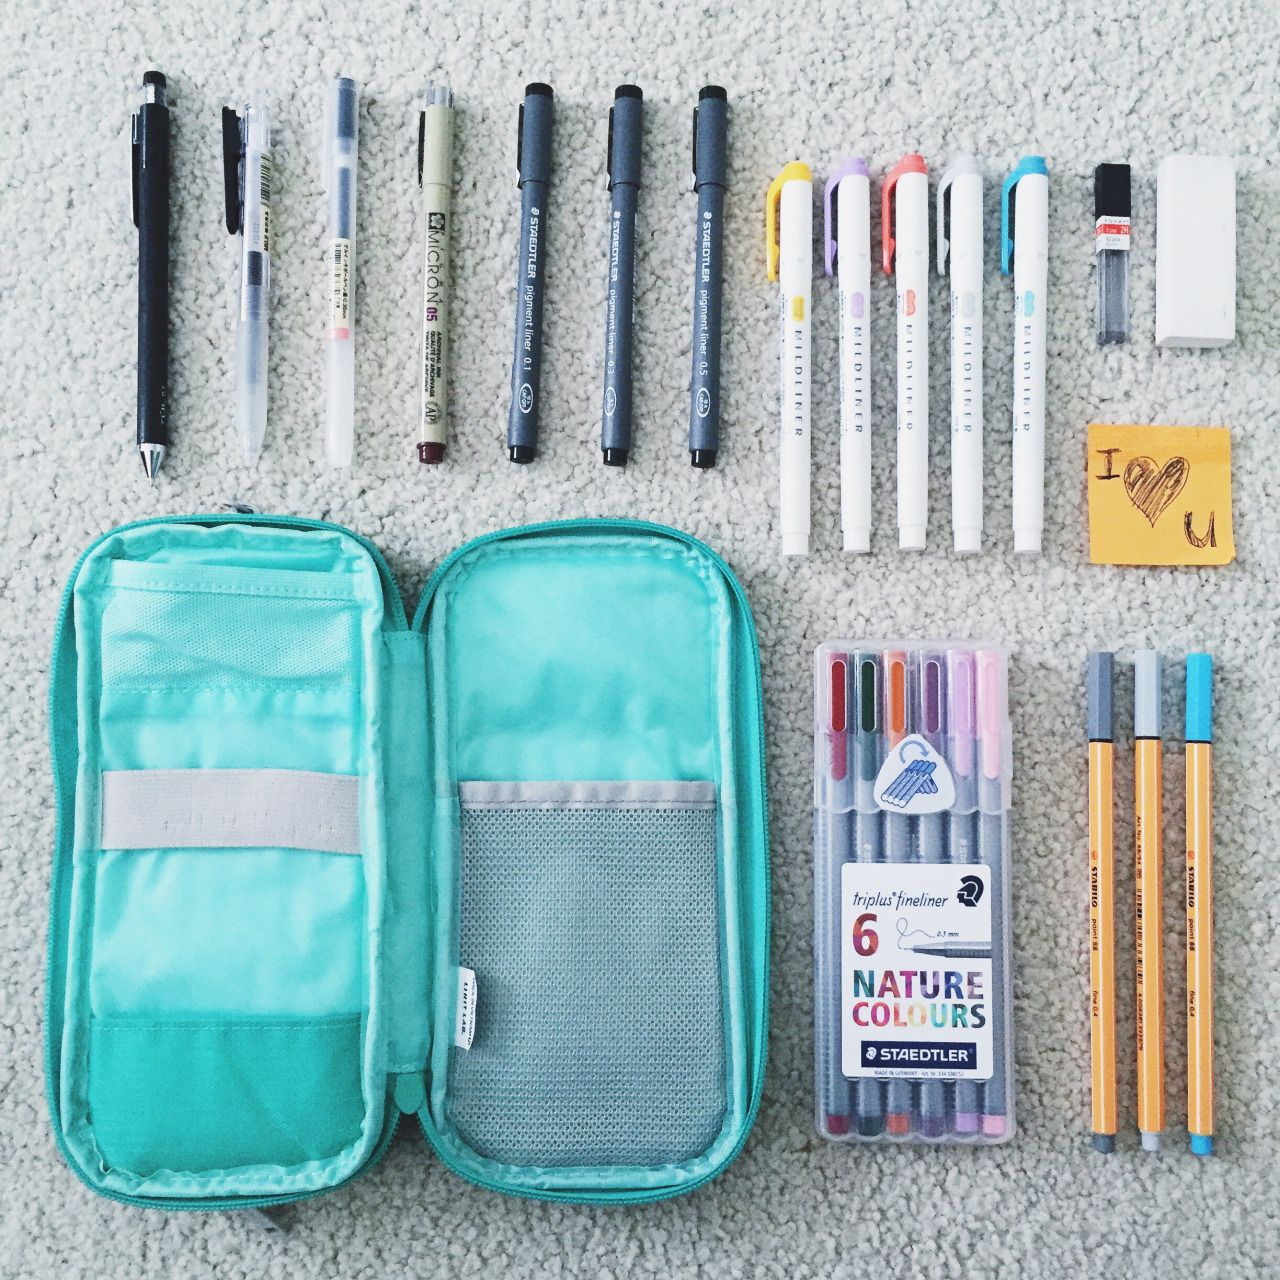 Pencil Mignon do it yourself 6